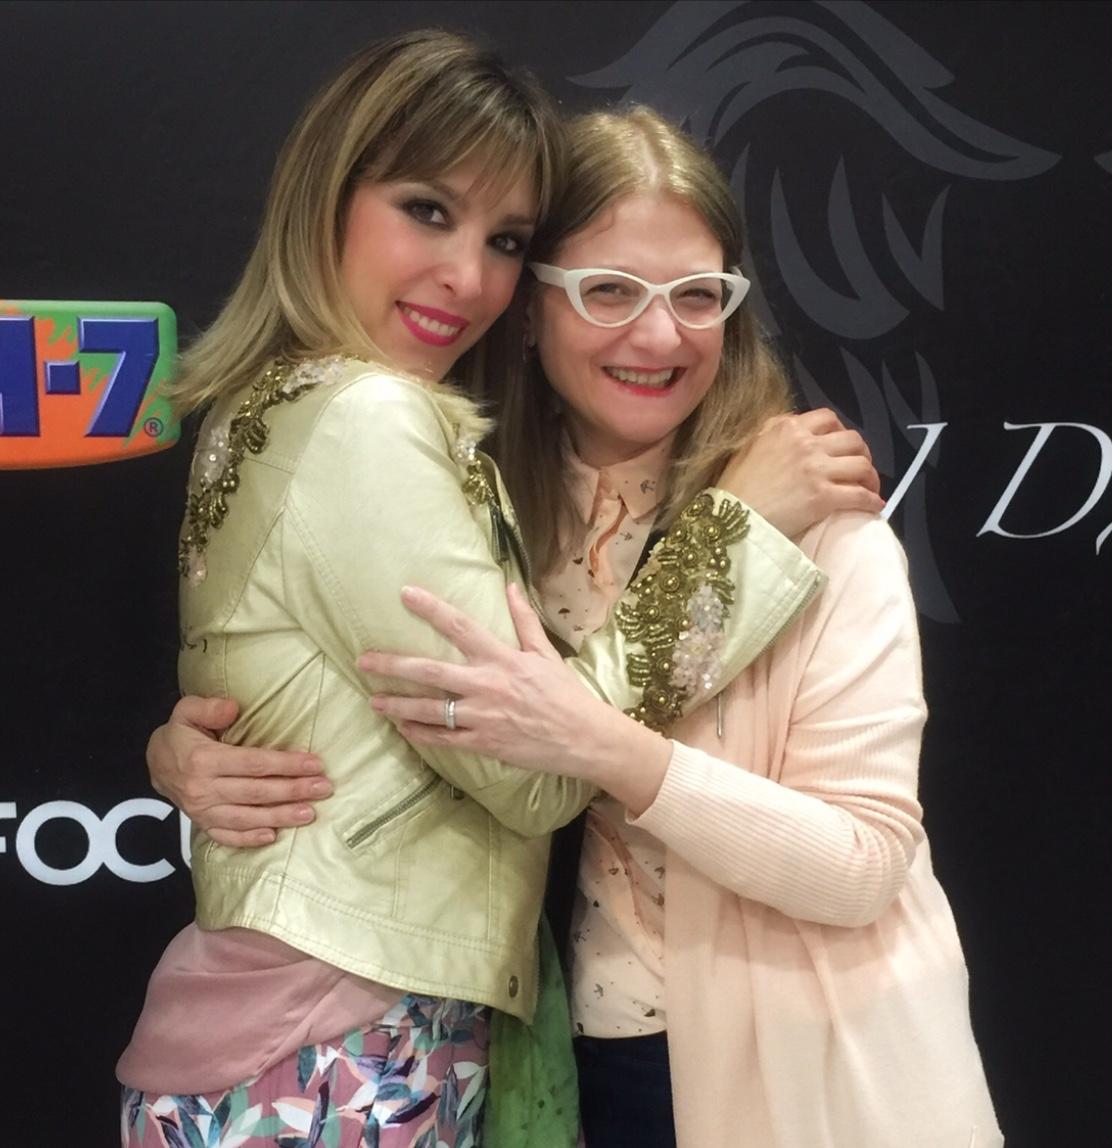 Marijo con Gisela BBFW